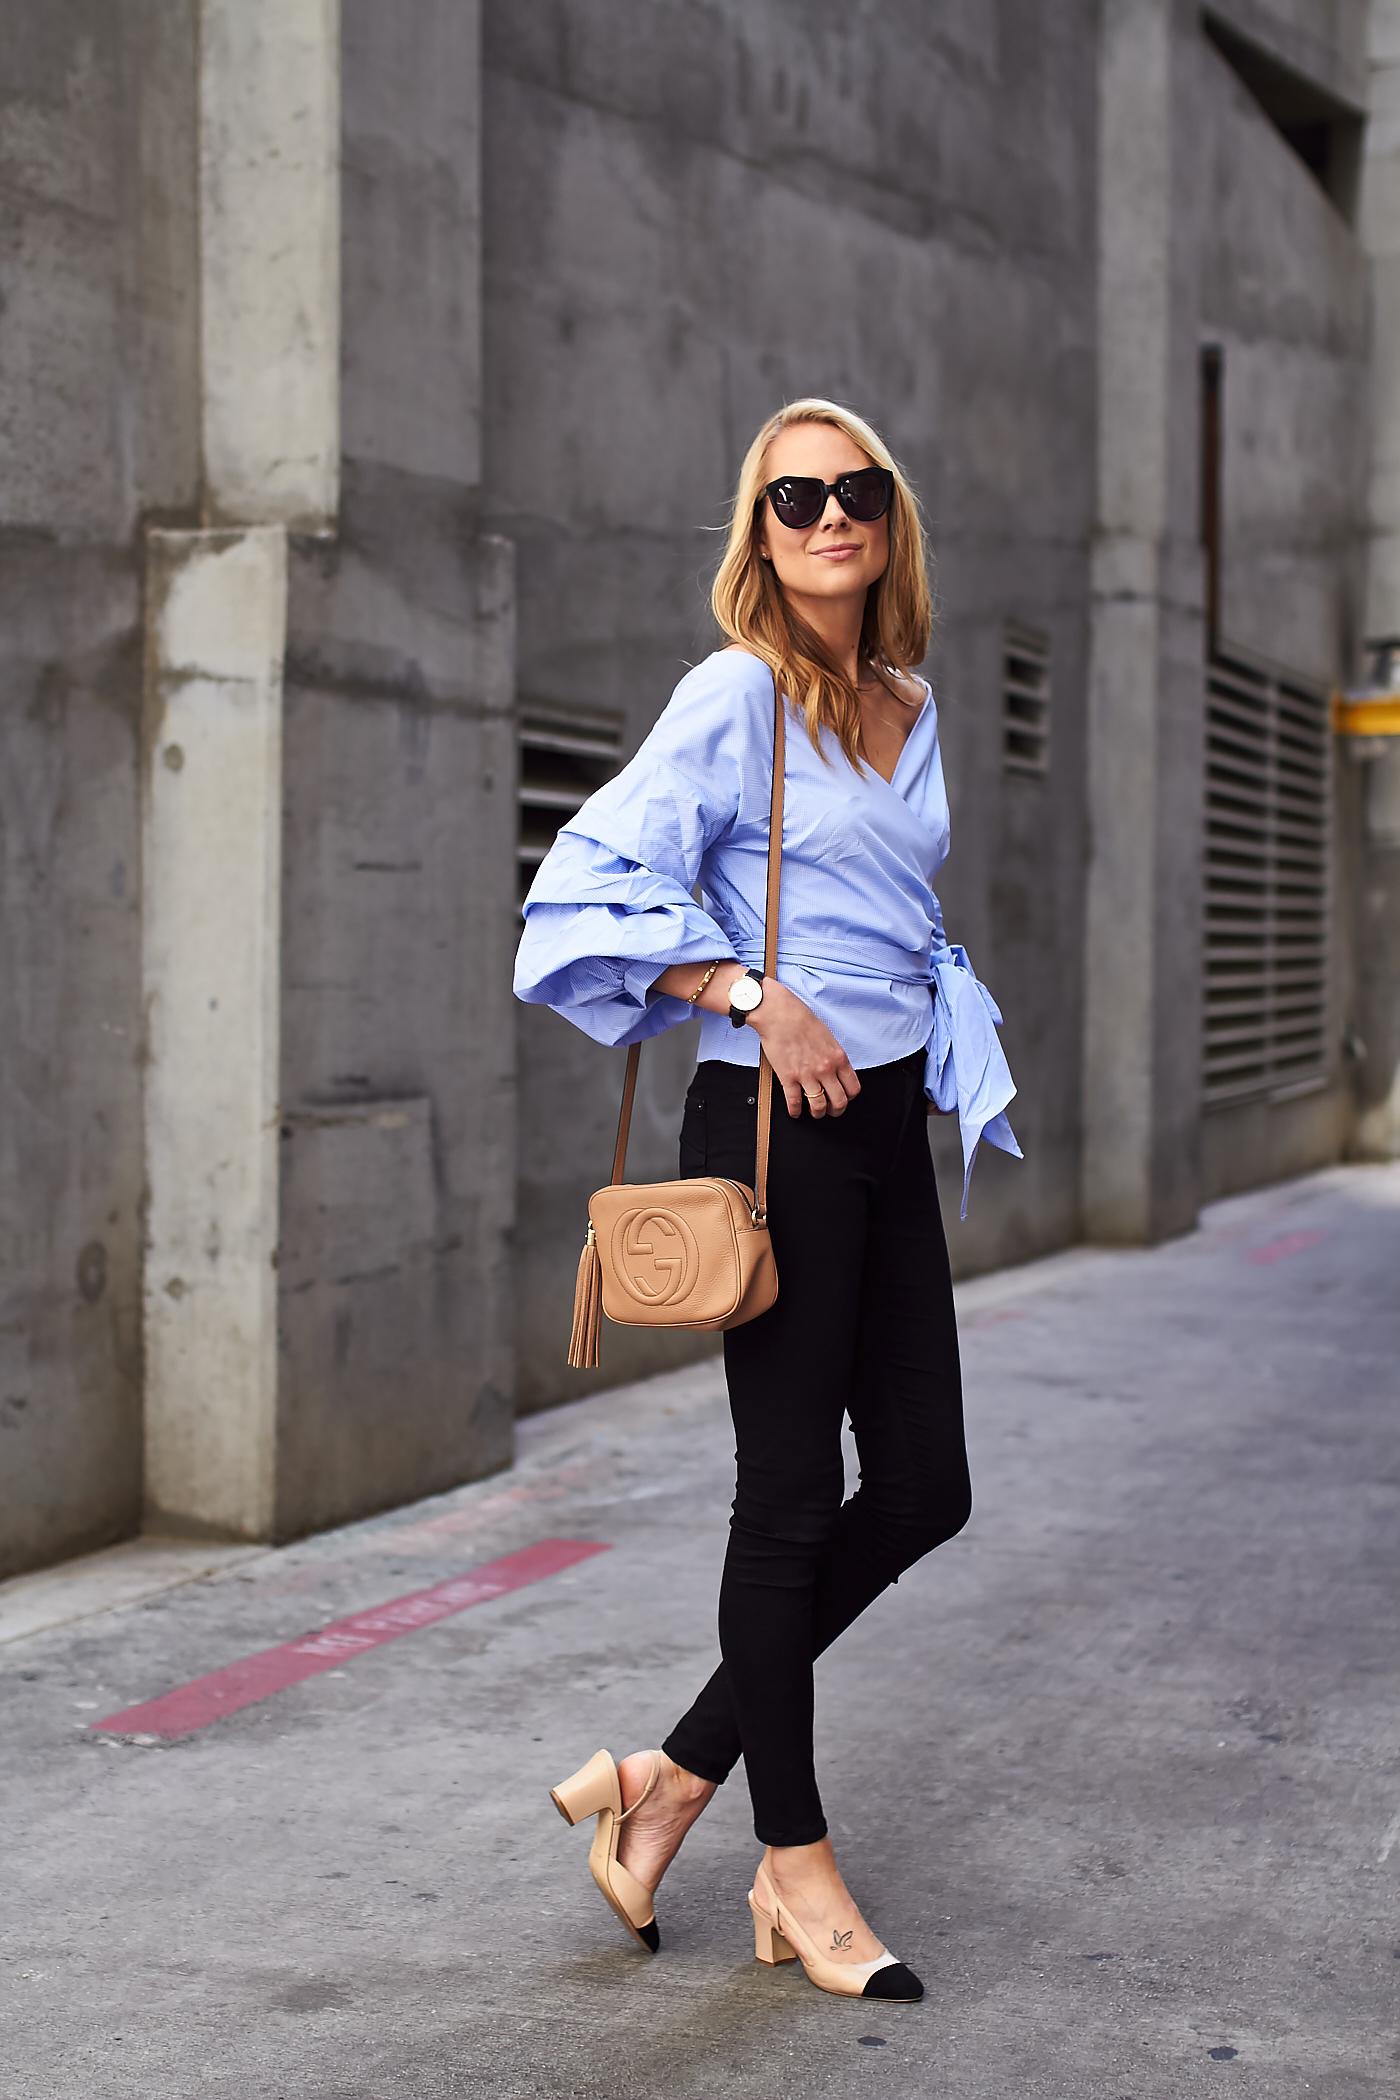 fashion-jackson-james-jeans-black-skinny-jeans-blue-ruffle-sleeve-wrap-top-gucci-soho-handbag